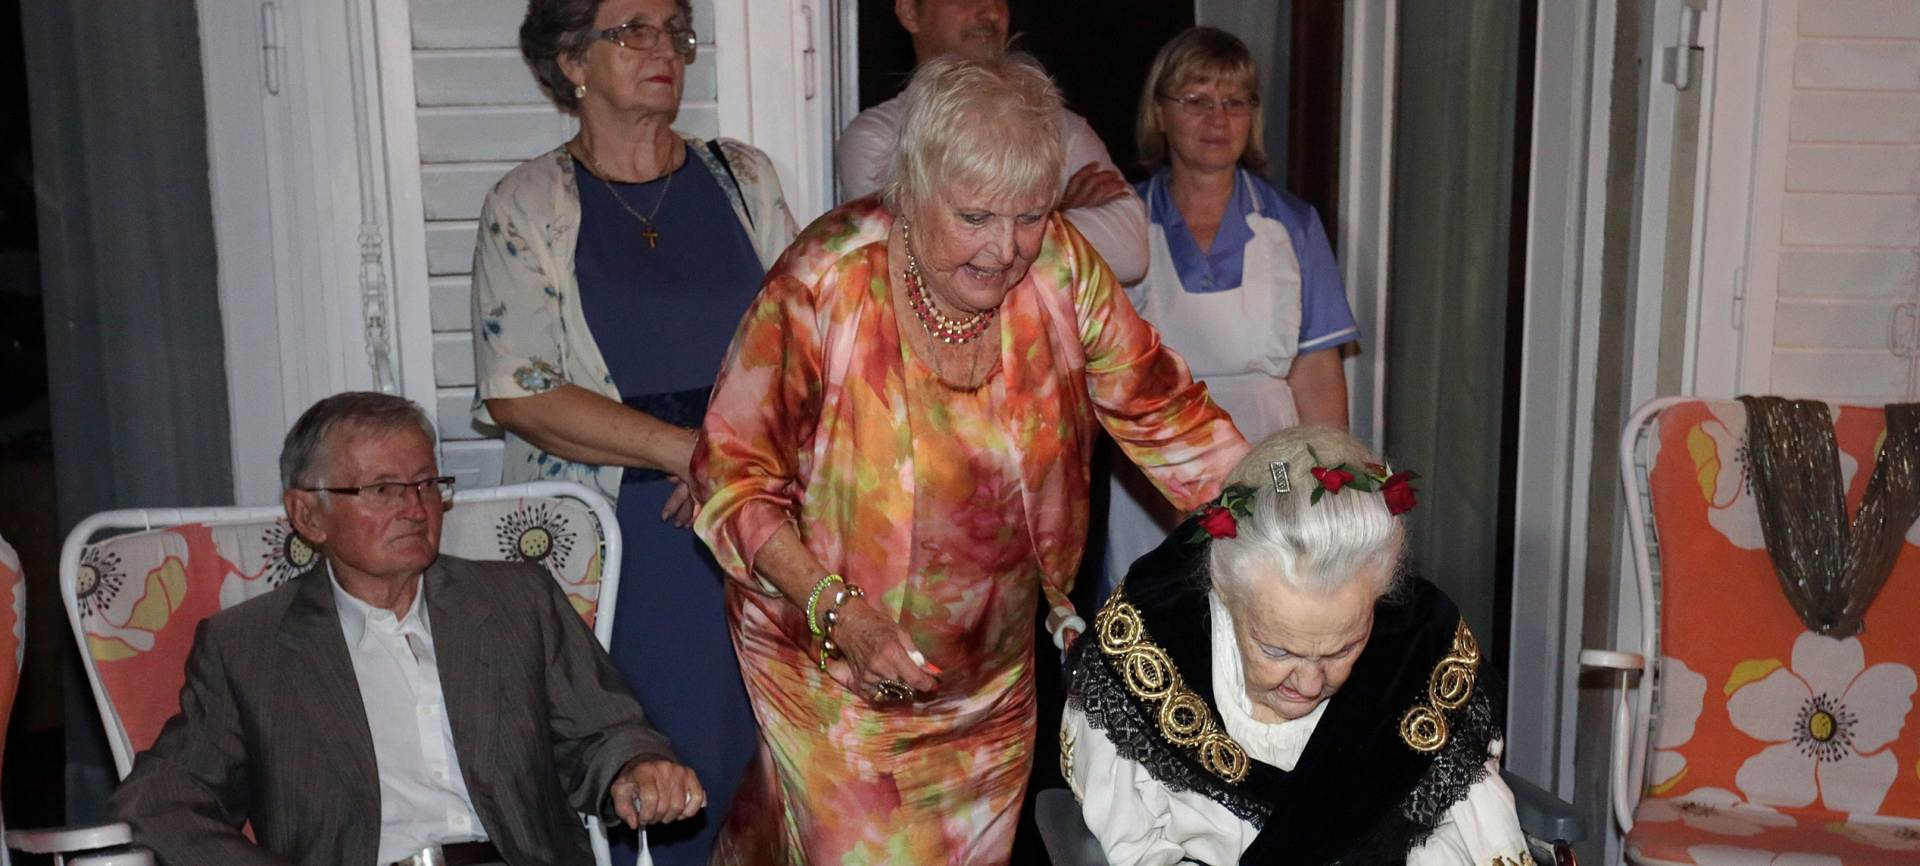 NEDA PRPIĆ GAMIRŠEK: Počasna predsjednica HSS-a proslavila 100. rođendan